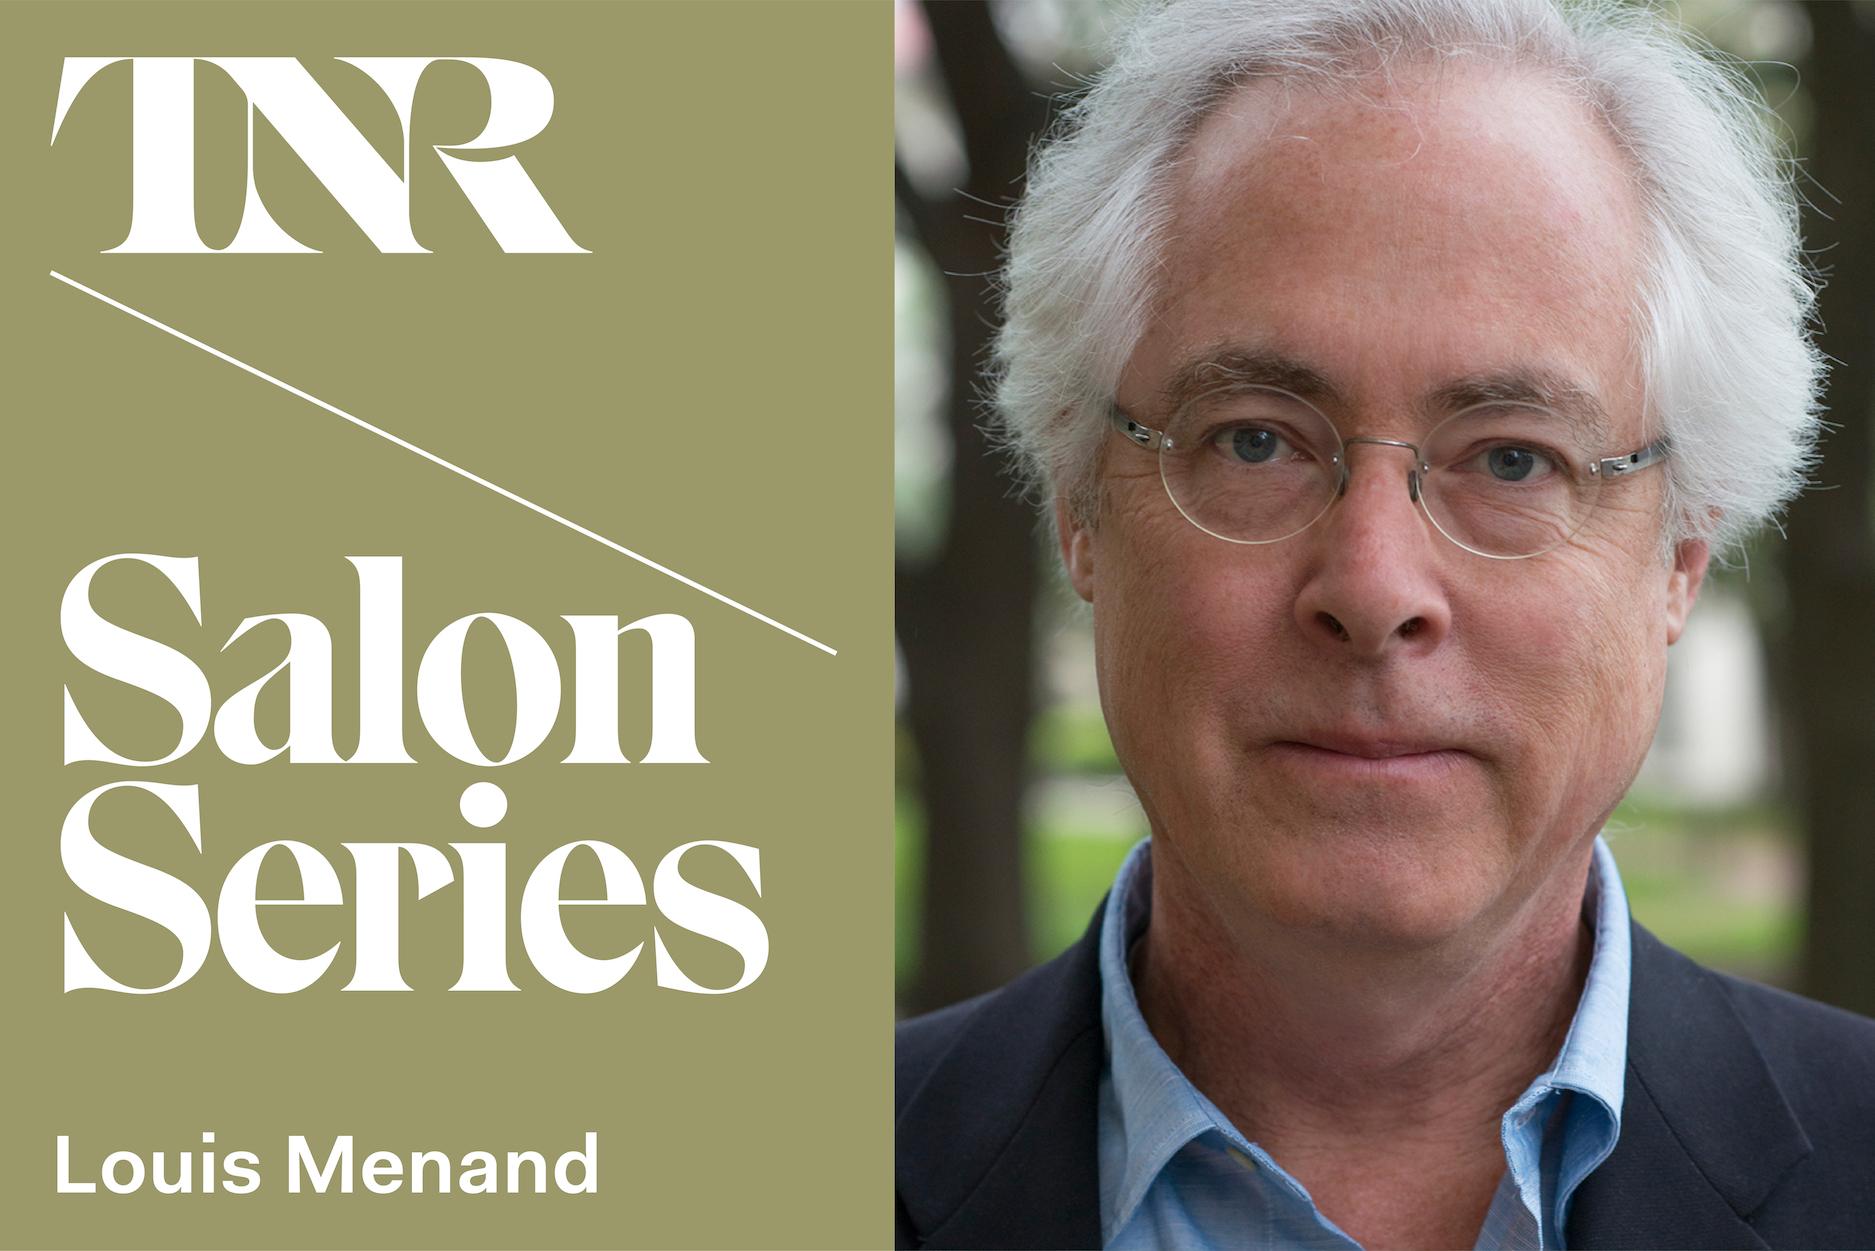 TNR Salon Series With Louis Menand